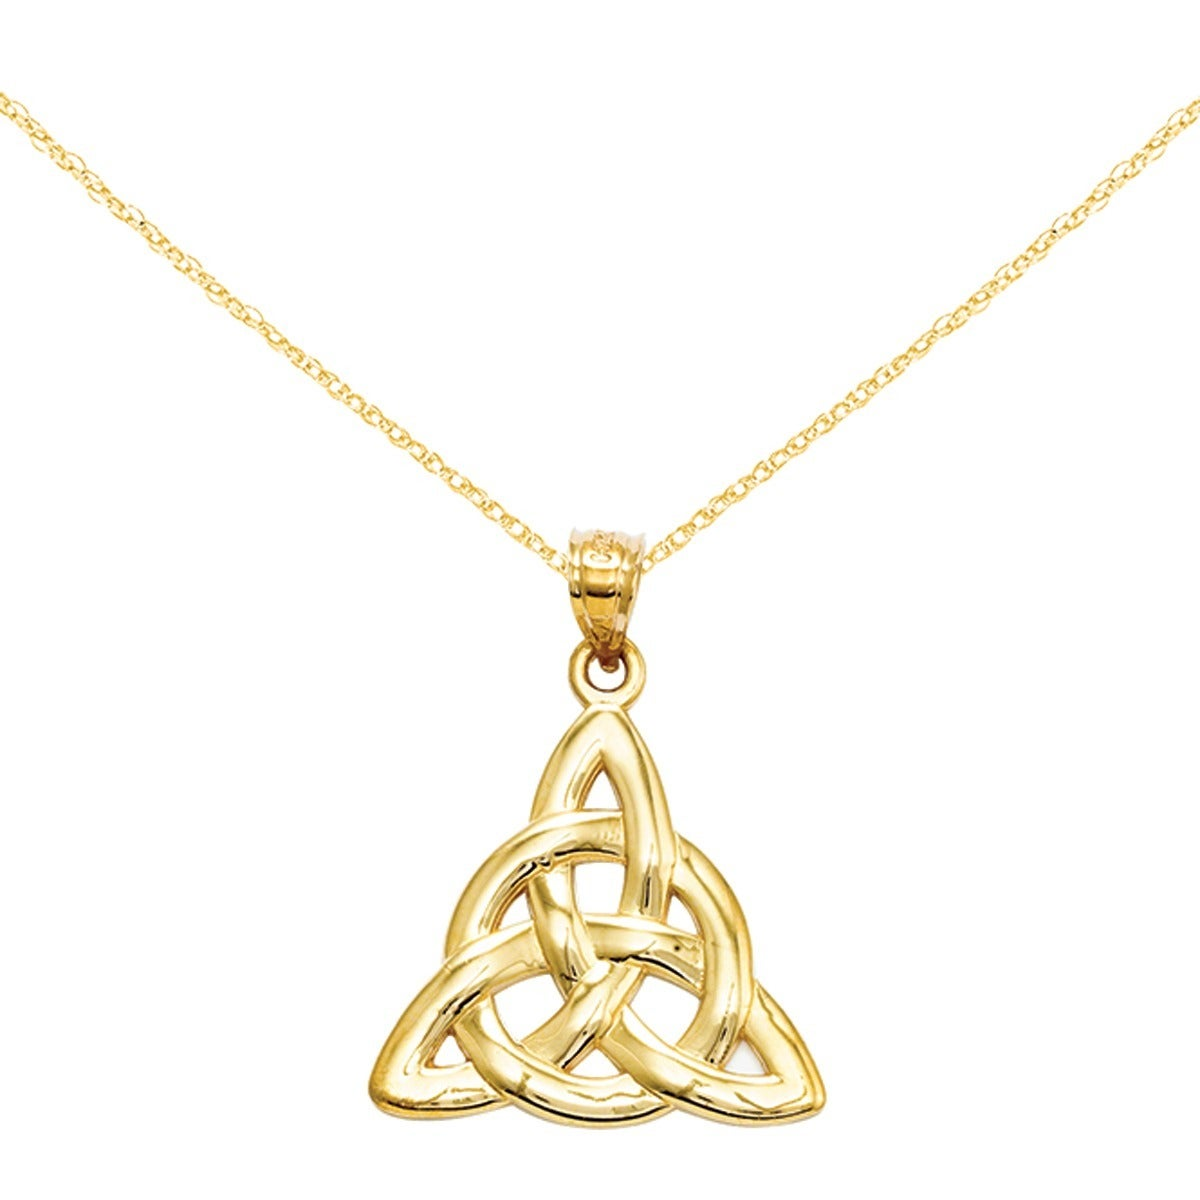 Shop 14 karat yellow gold trinity pendant with 18 inch chain free shop 14 karat yellow gold trinity pendant with 18 inch chain free shipping today overstock 14678777 aloadofball Gallery